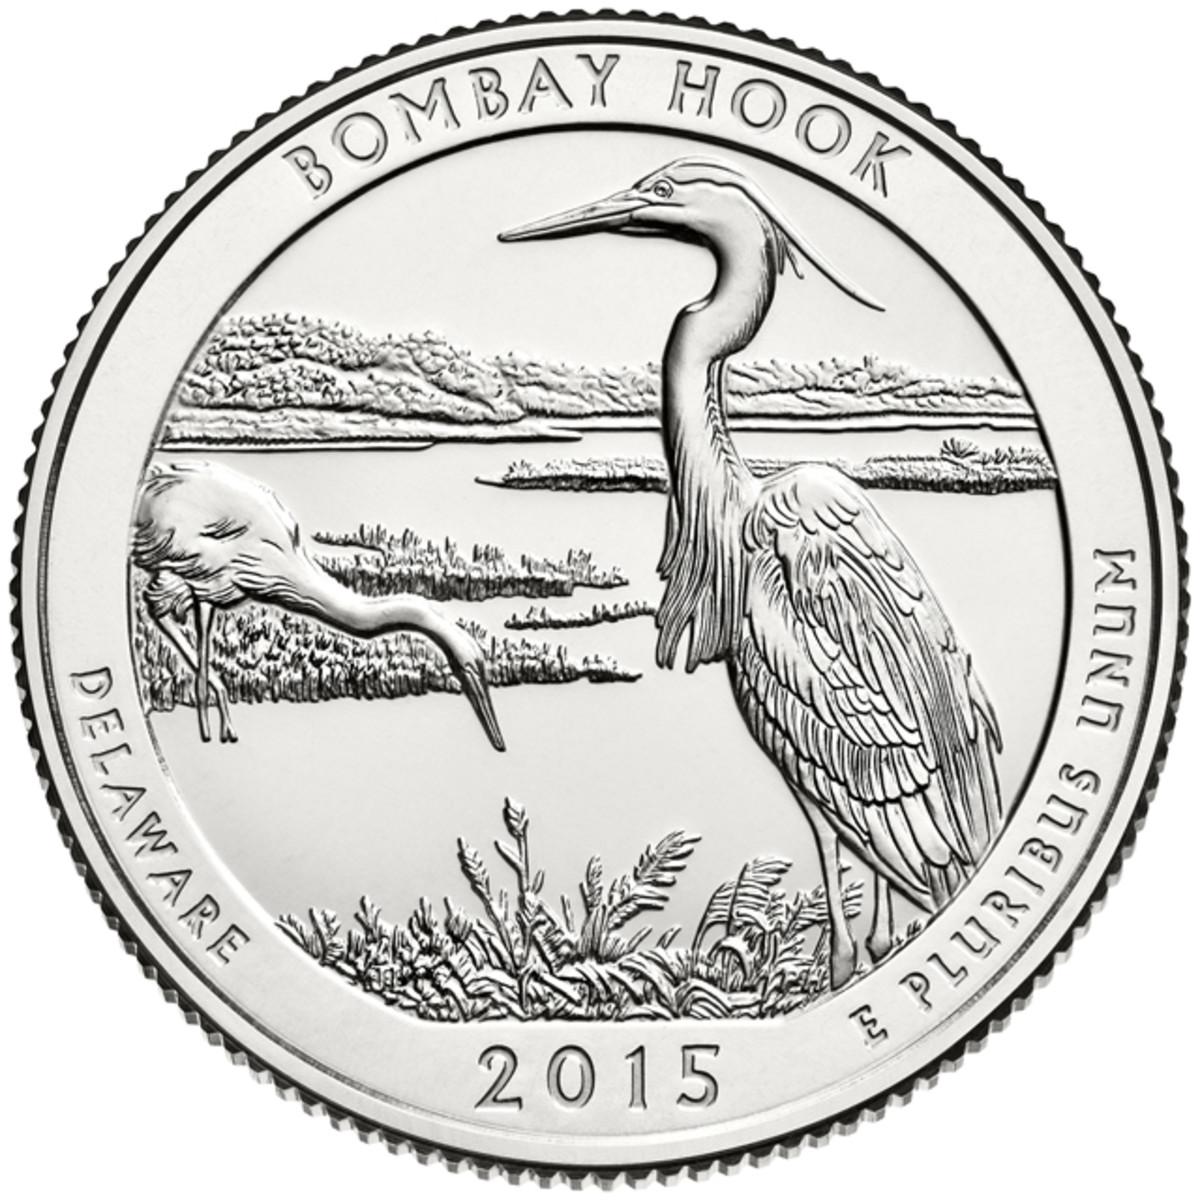 The 2015 Bombay Hook